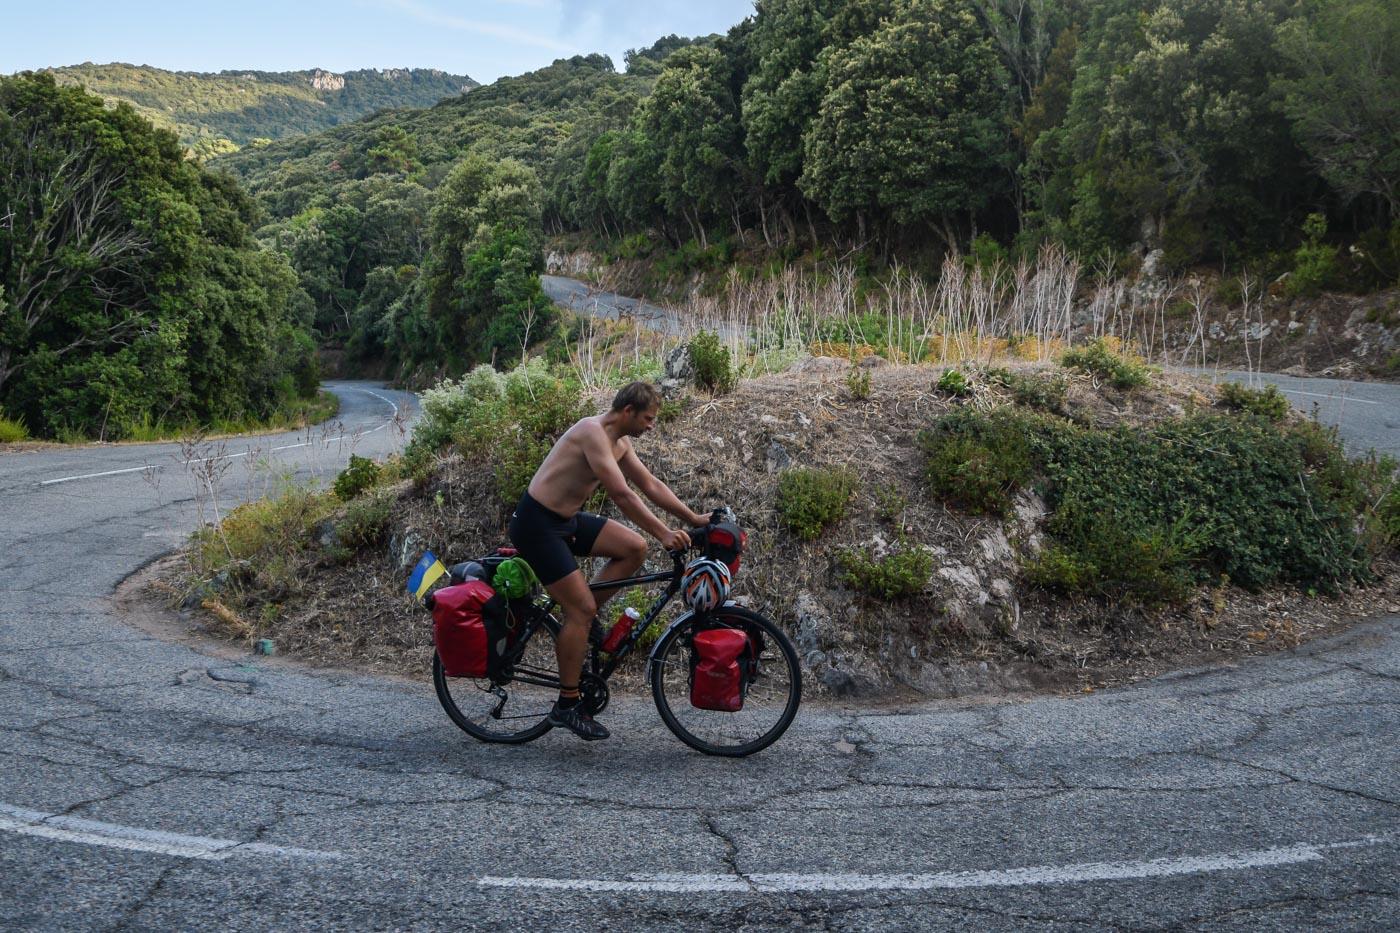 Путешествие на велосипеде по Корсике, Франция - Аяччо